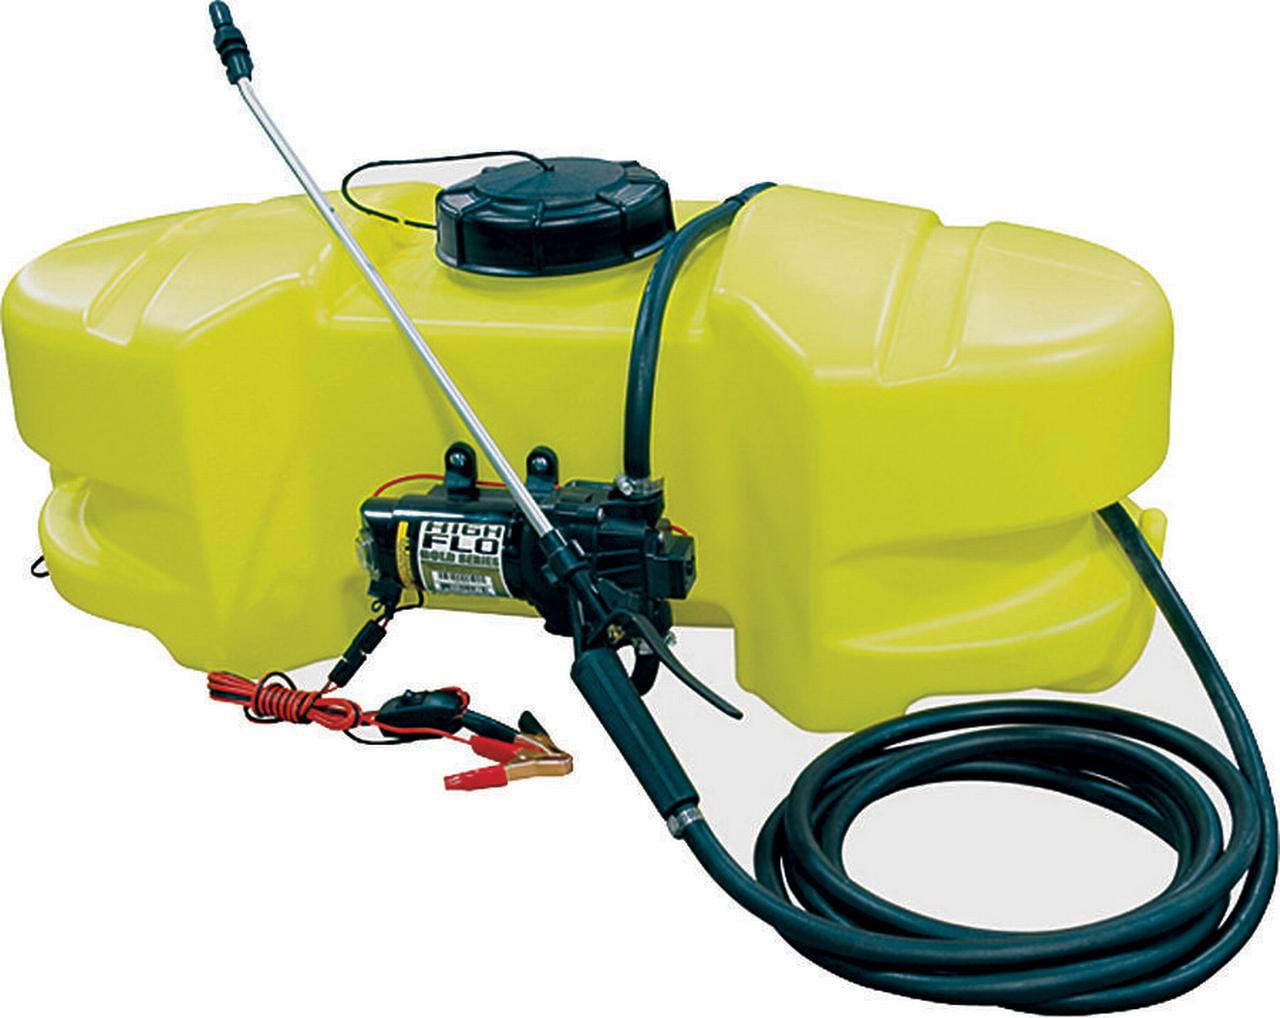 AG South Gold SC15-SS-GTNS Spot Sprayer, 15 gal Polyethylene Tank by AG SOUTH